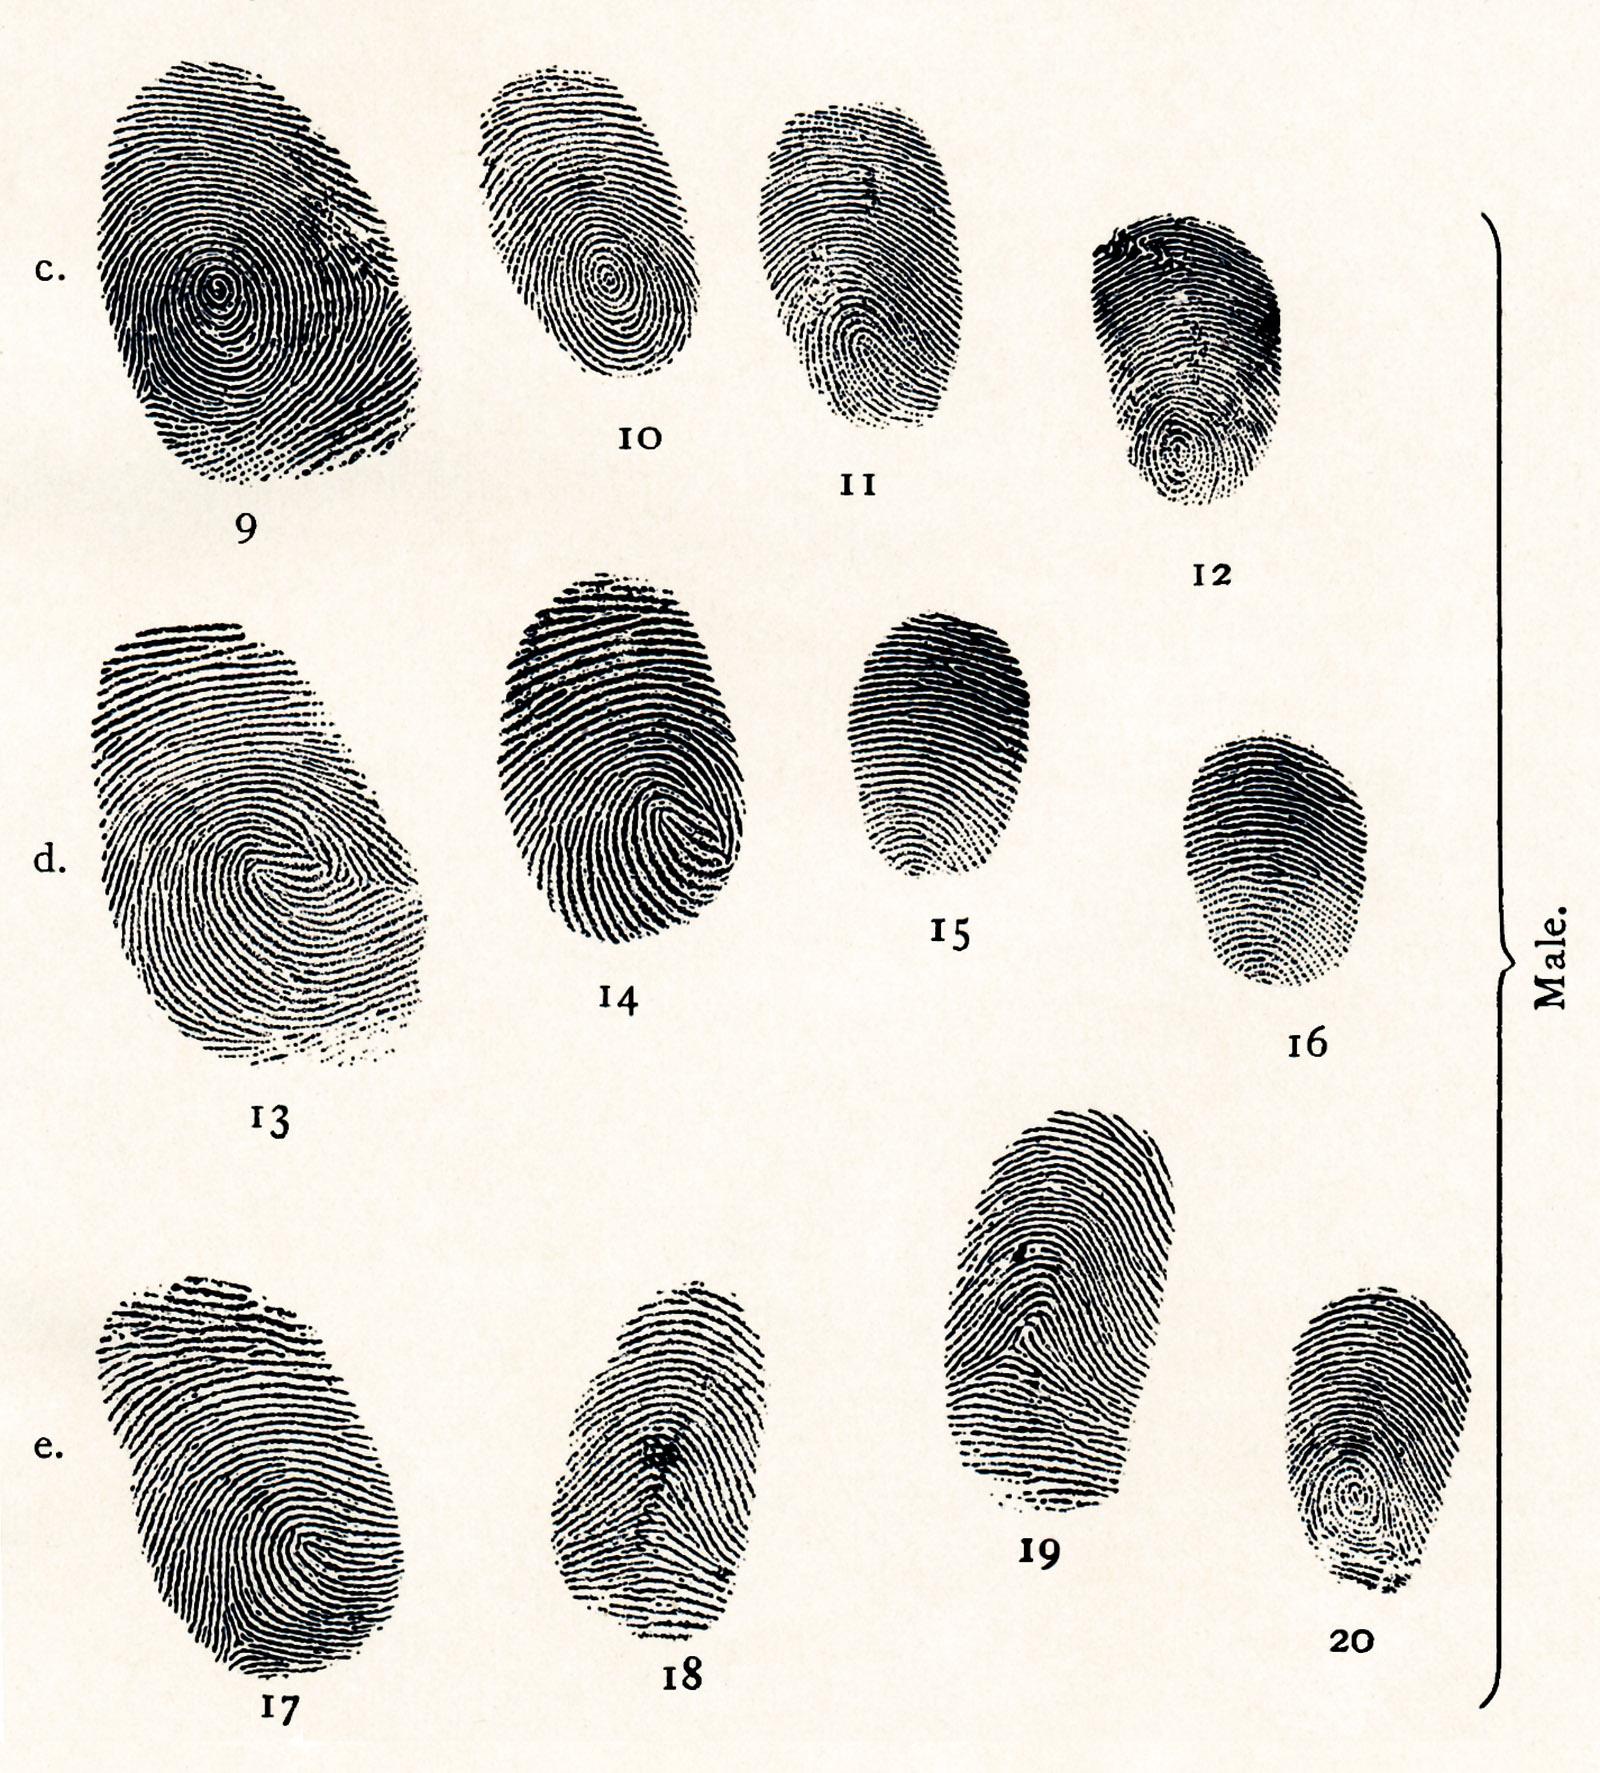 Illustration from Henry Faulds's Guide to Finger-print Identification, 1905